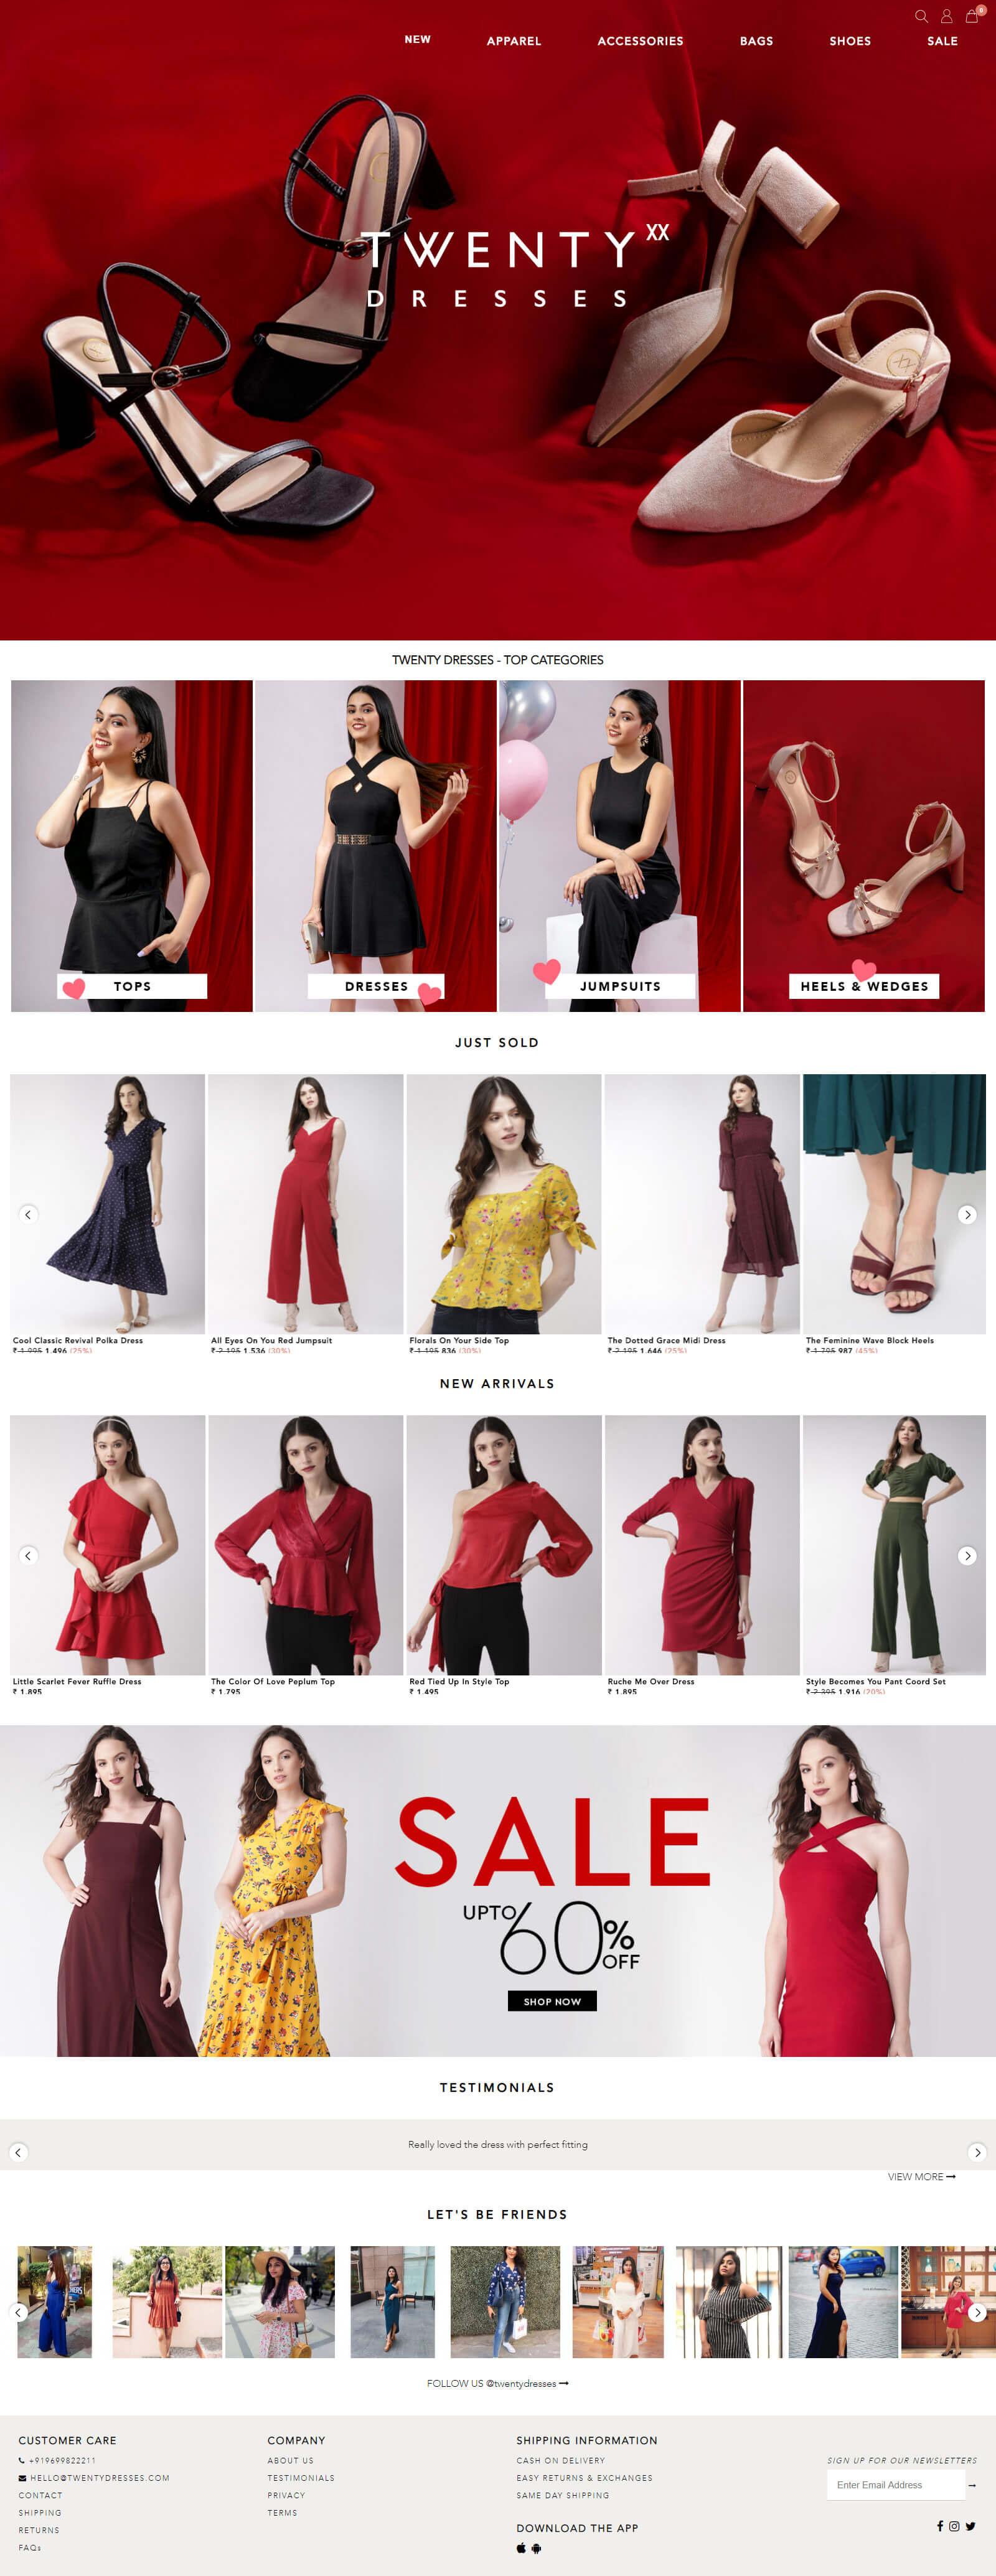 Twenty Dresses